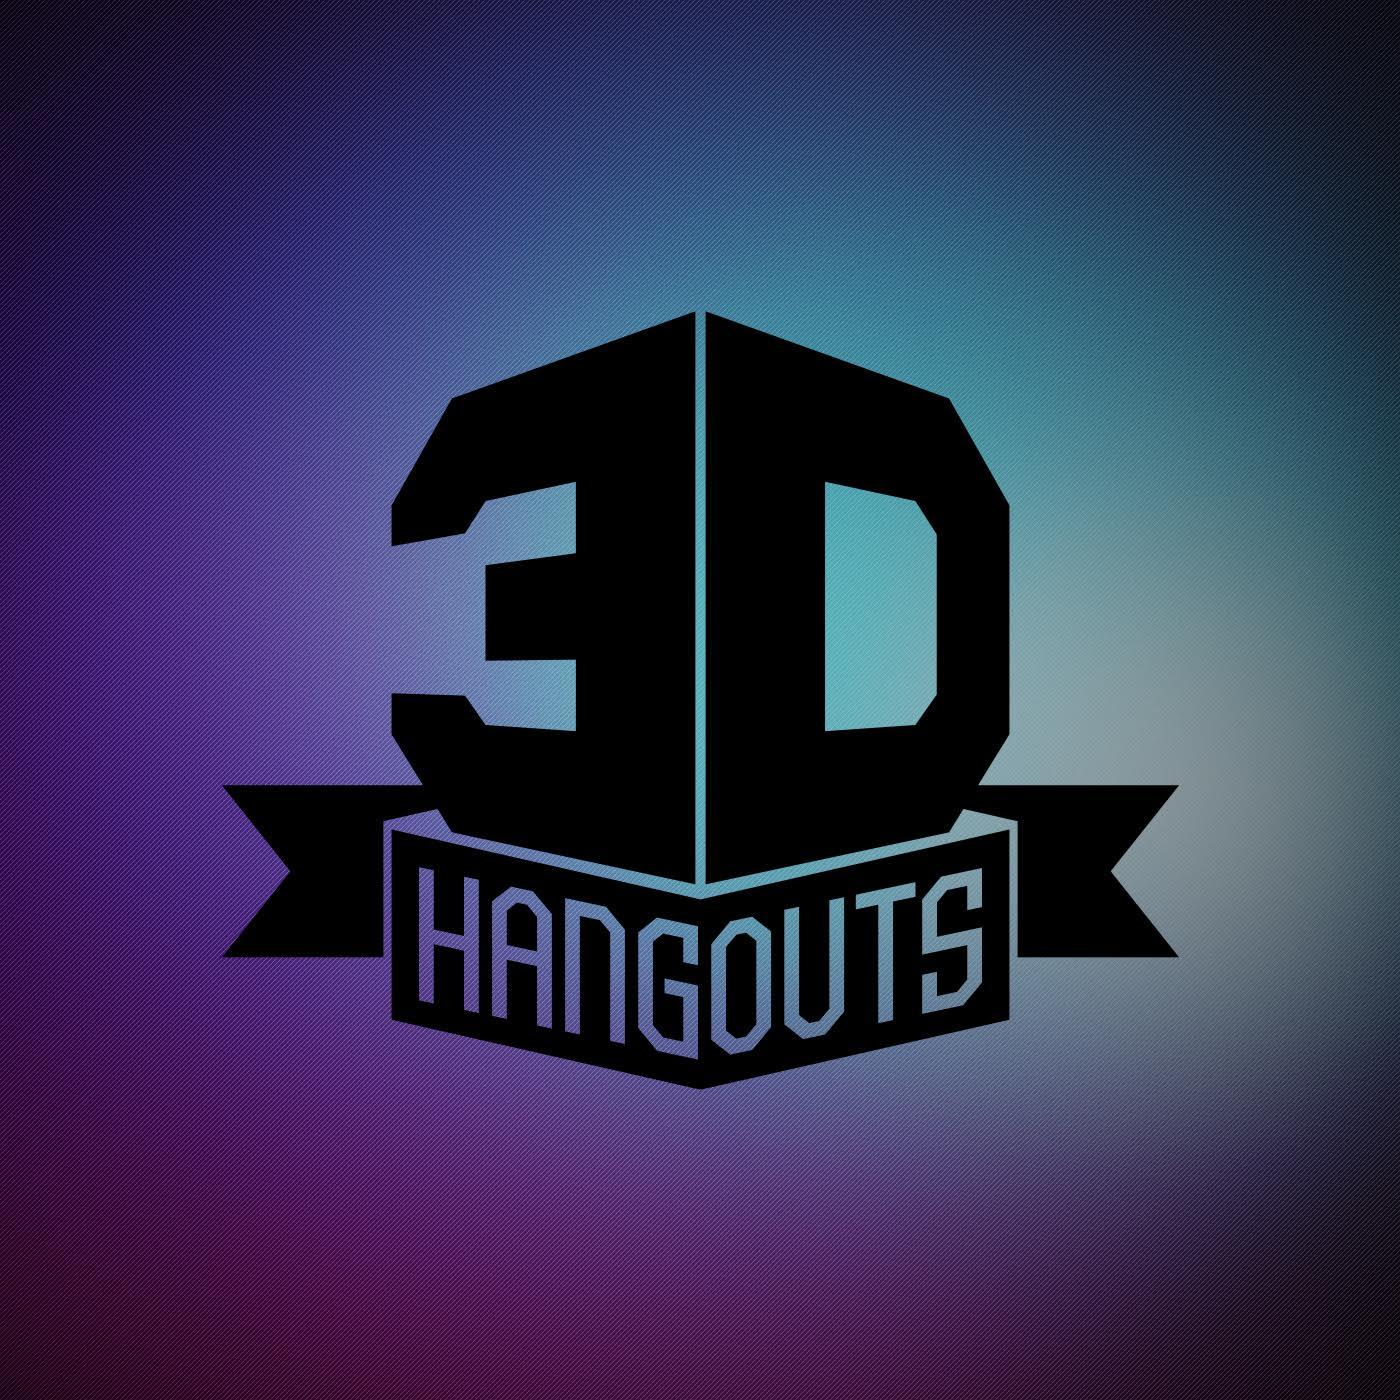 3D Hangouts– IOT Mailbox 3D Hangouts podcast